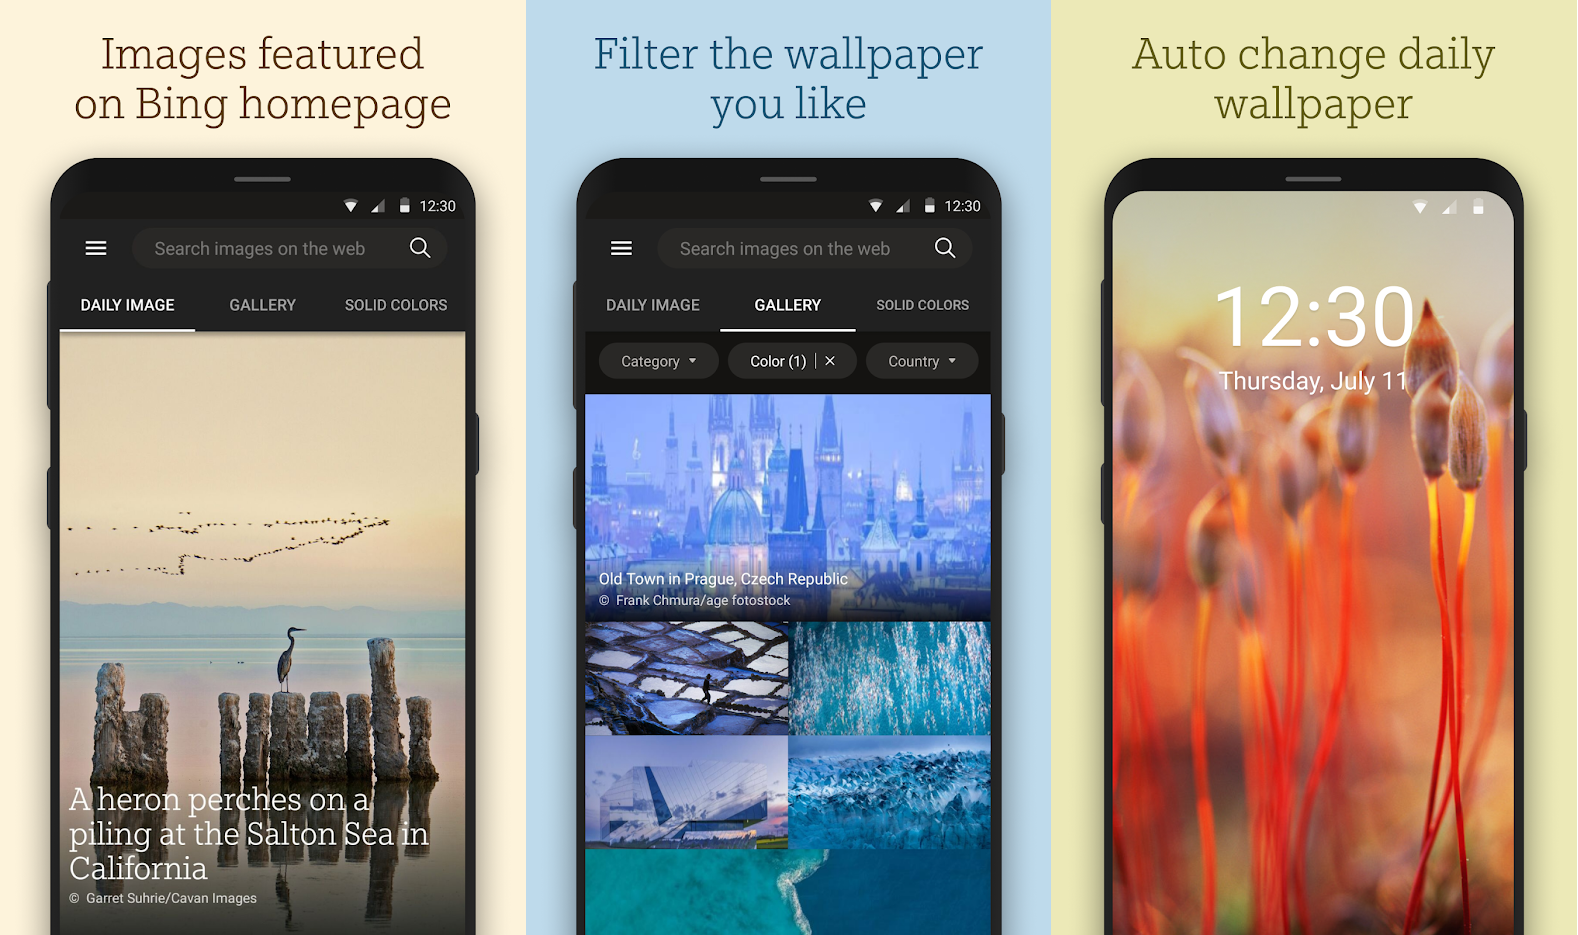 "alt=""ภาพตัวอย่างแอพ Bing Wallpaper พร้อมคำอธิบายจาก Google Play"""